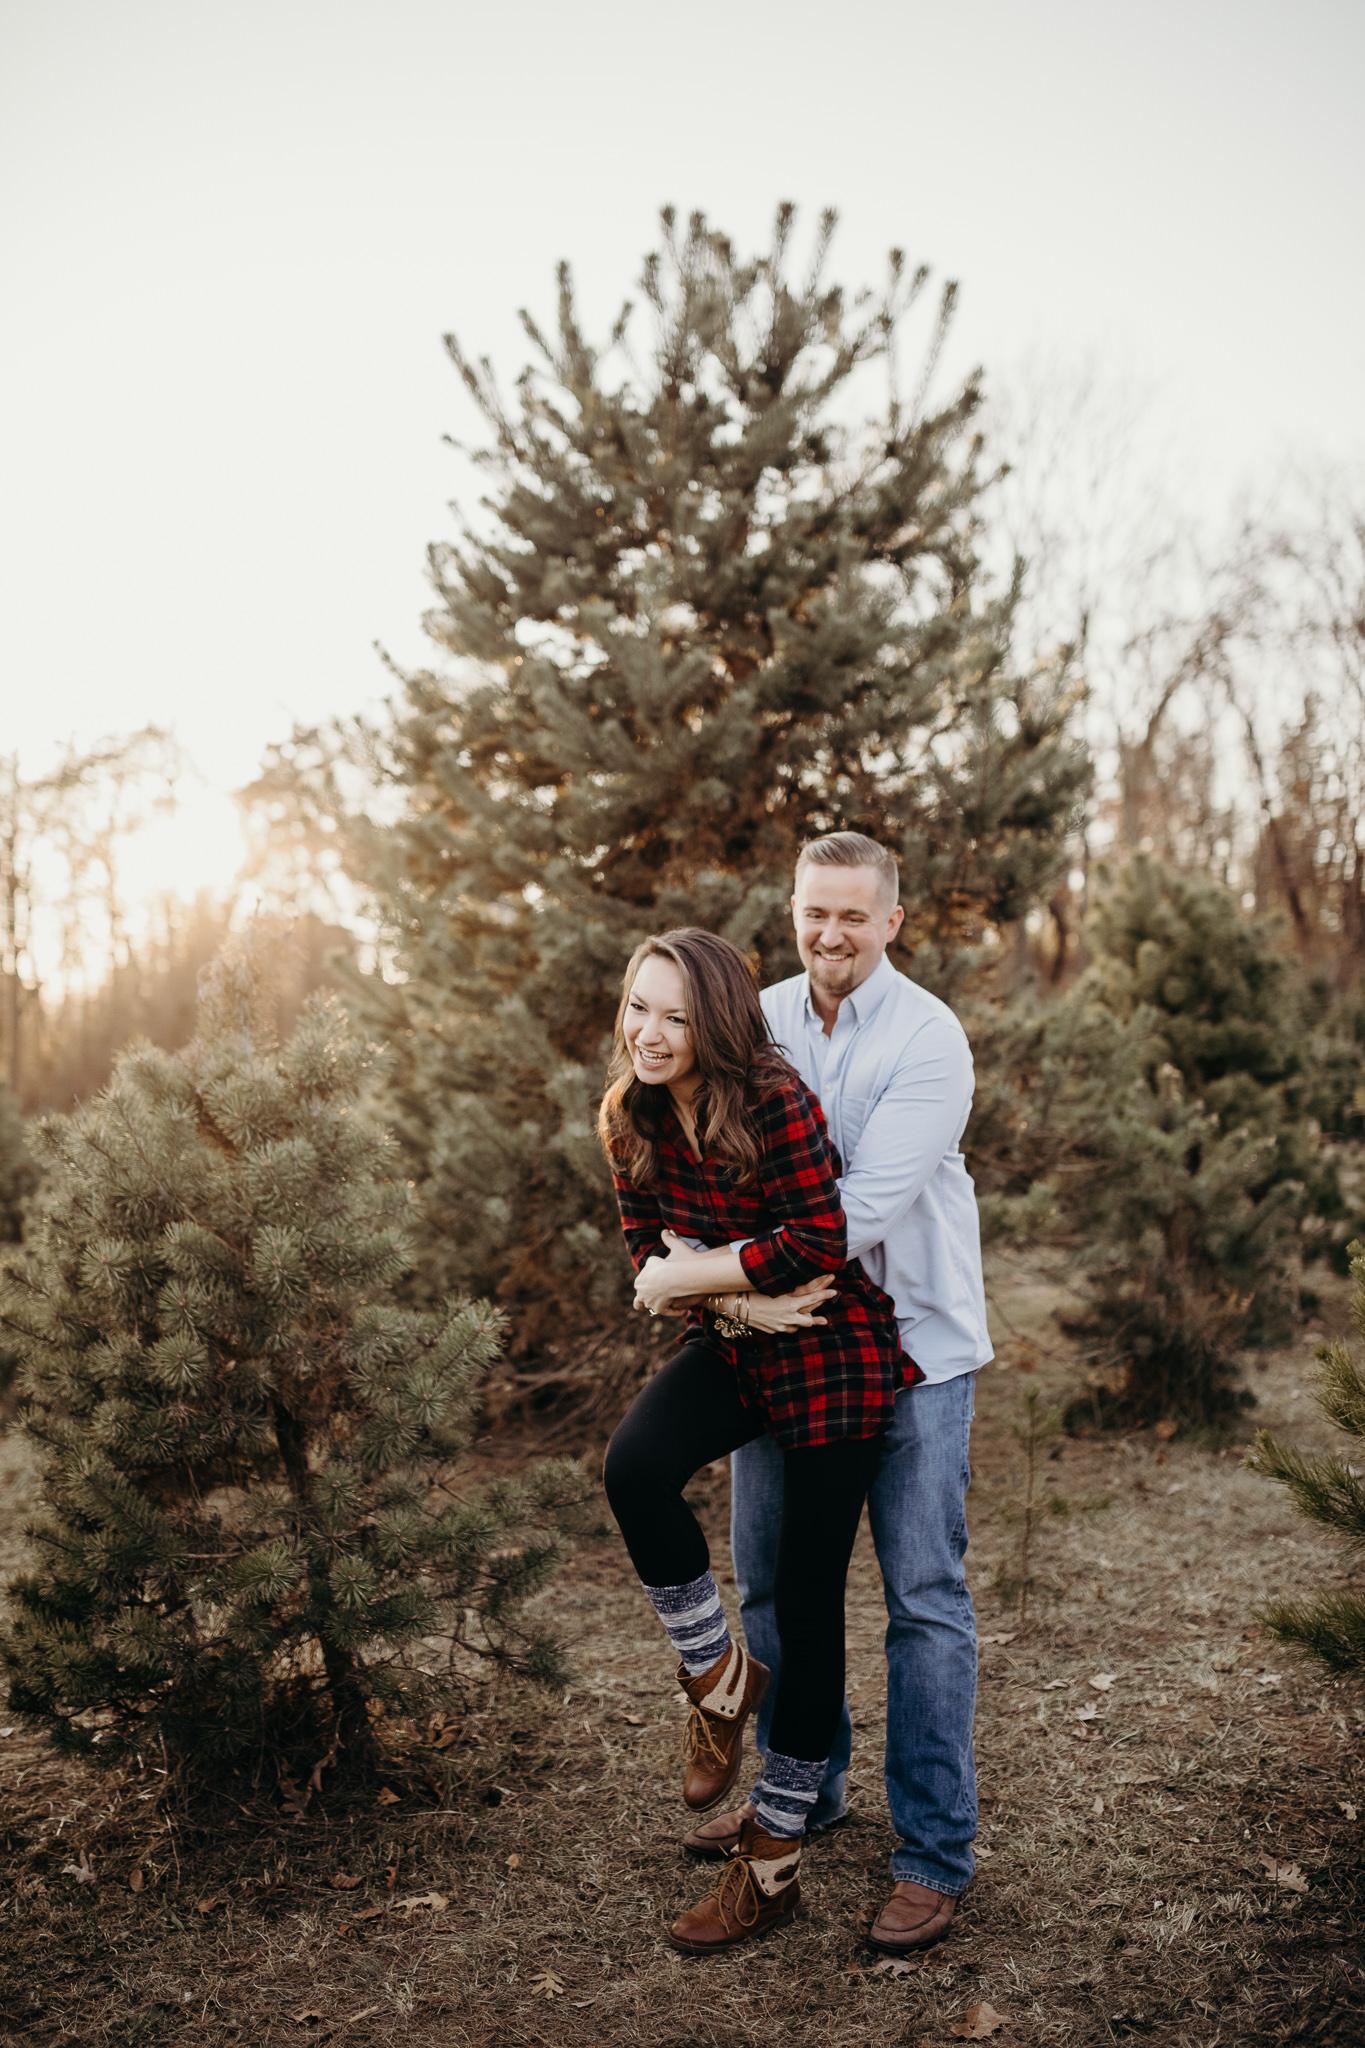 Engagement - Tree picking - Wedding Photographer - Virginia - Best - Pat Cori Photography-24.jpg